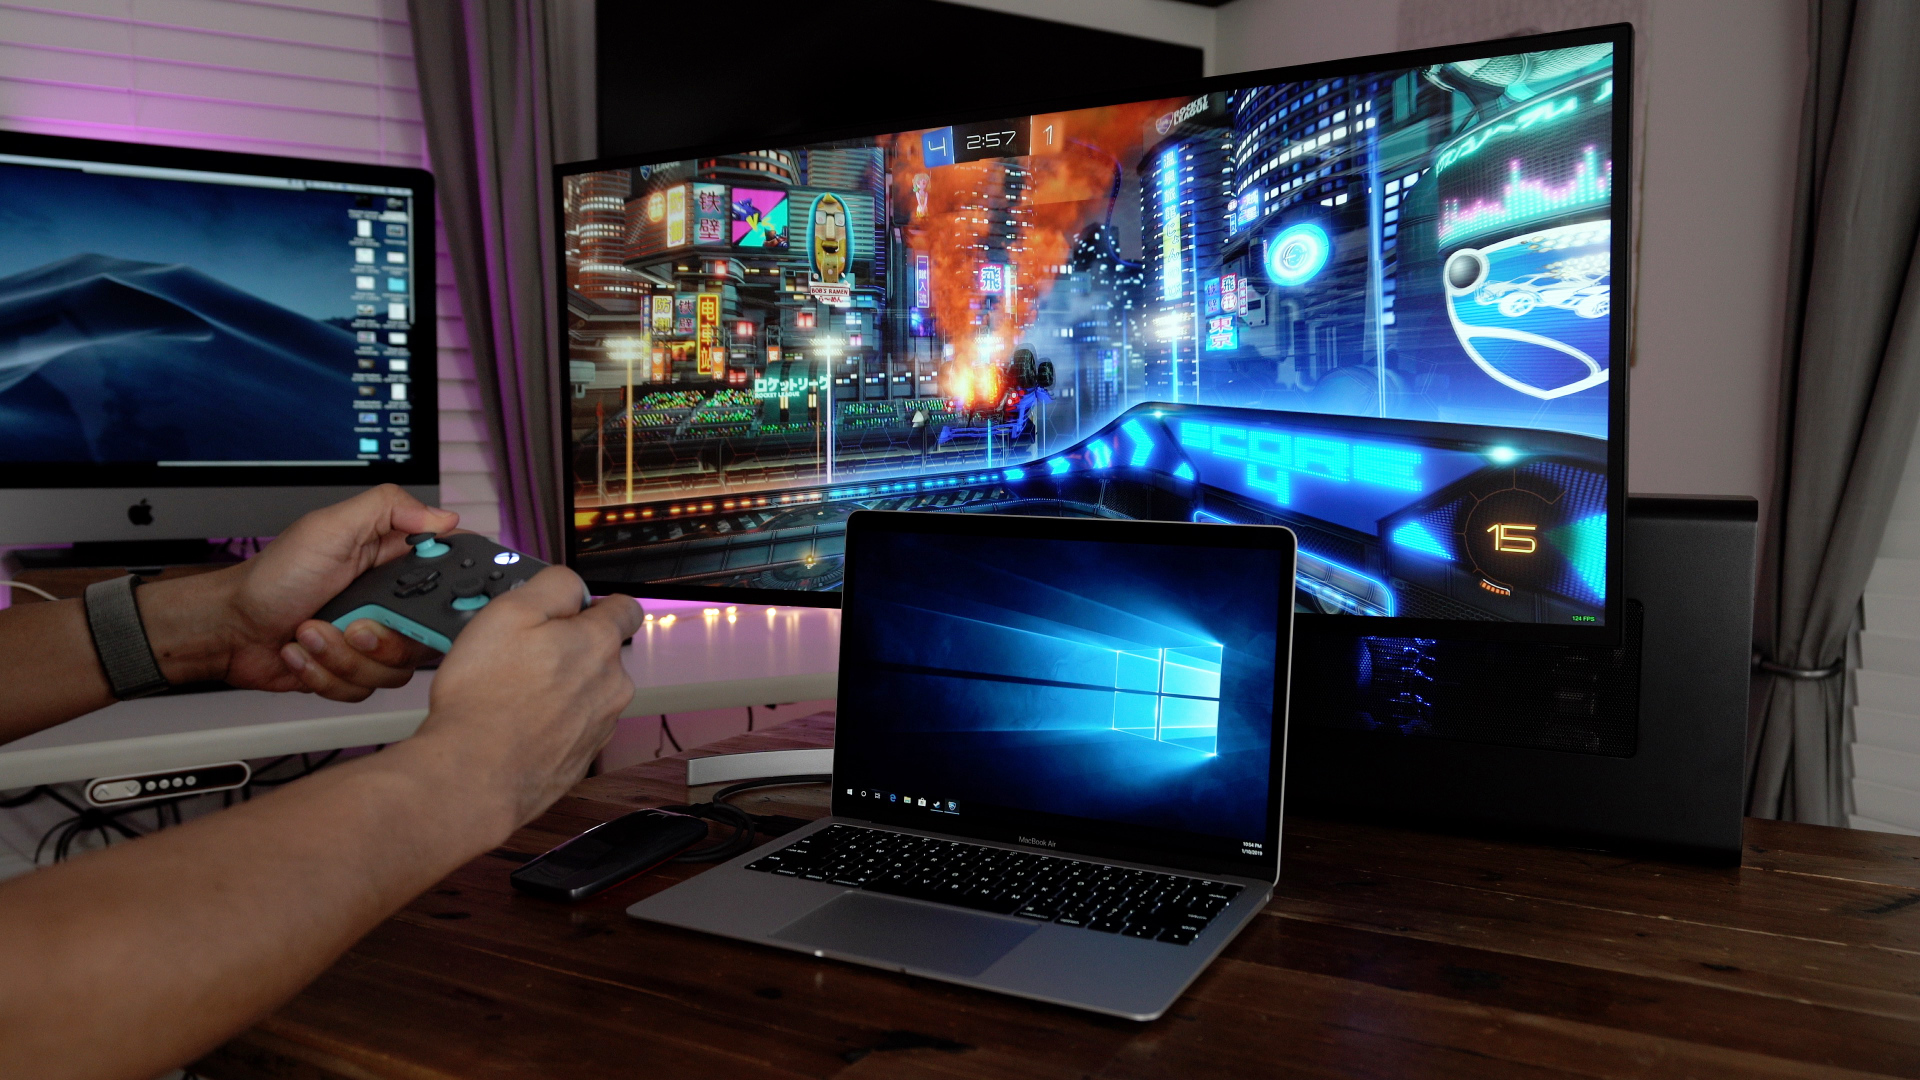 How to: MacBook Air Windows 10 RTX 2080 eGPU gaming setup [Video]